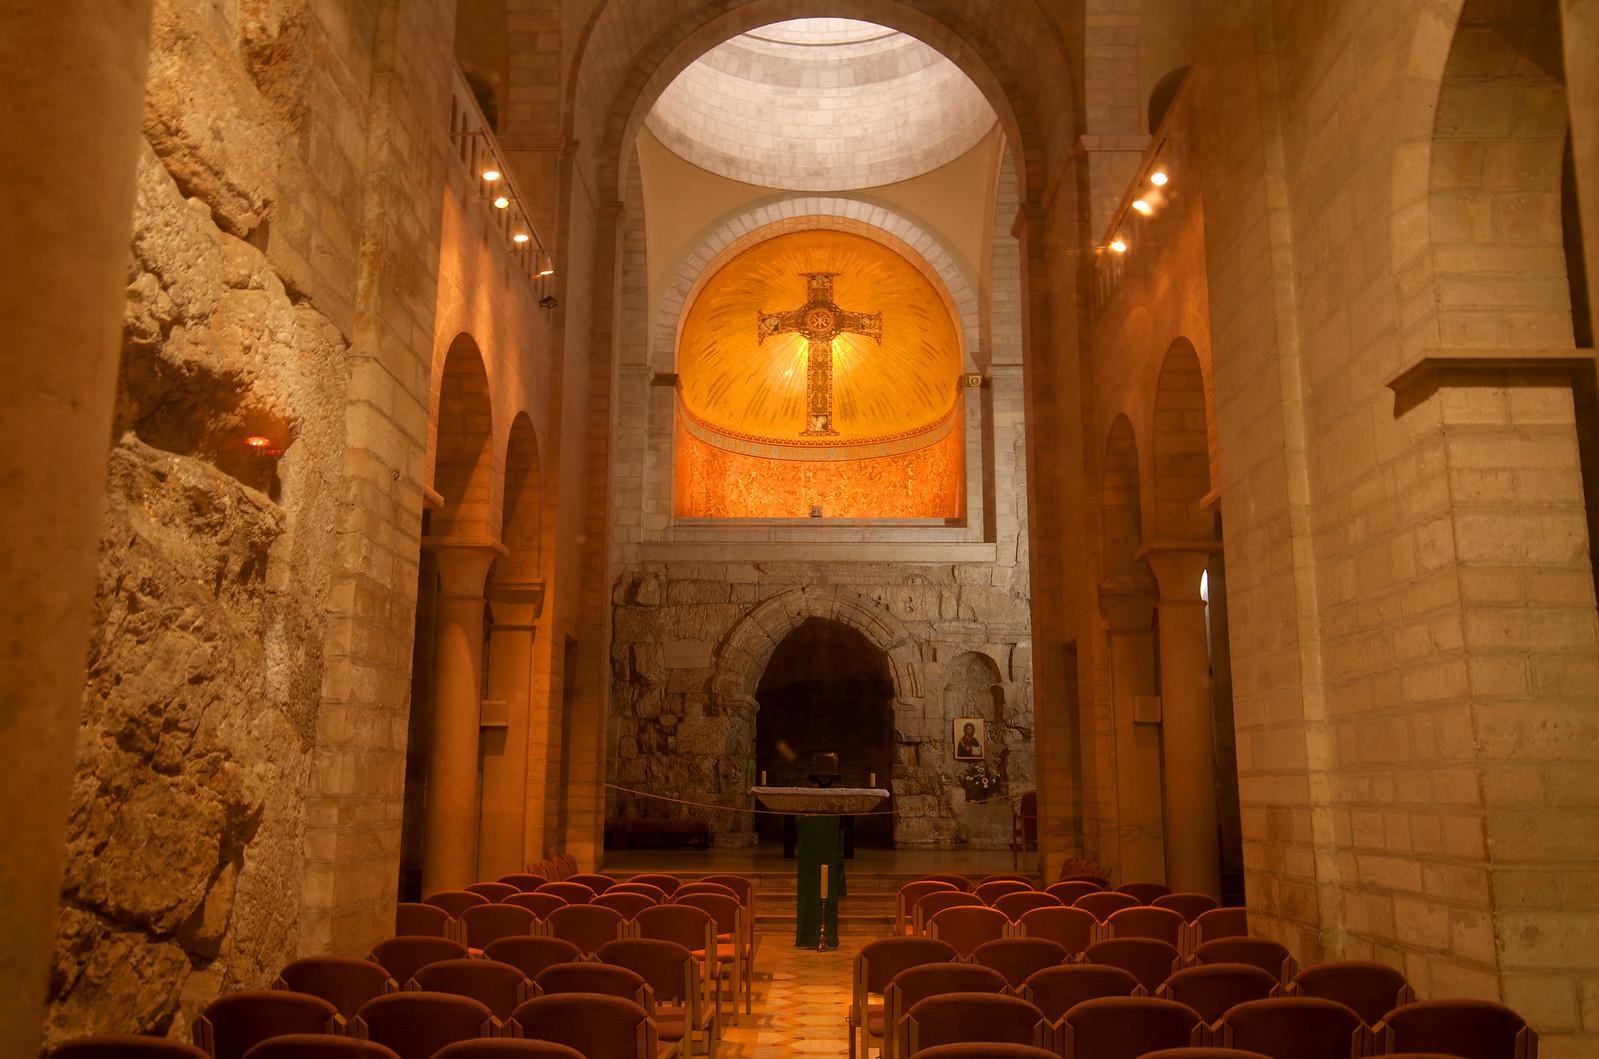 Jerusalem_Via Dolorosa_Ecce Homo Basilica_Noam Chen_IMOT